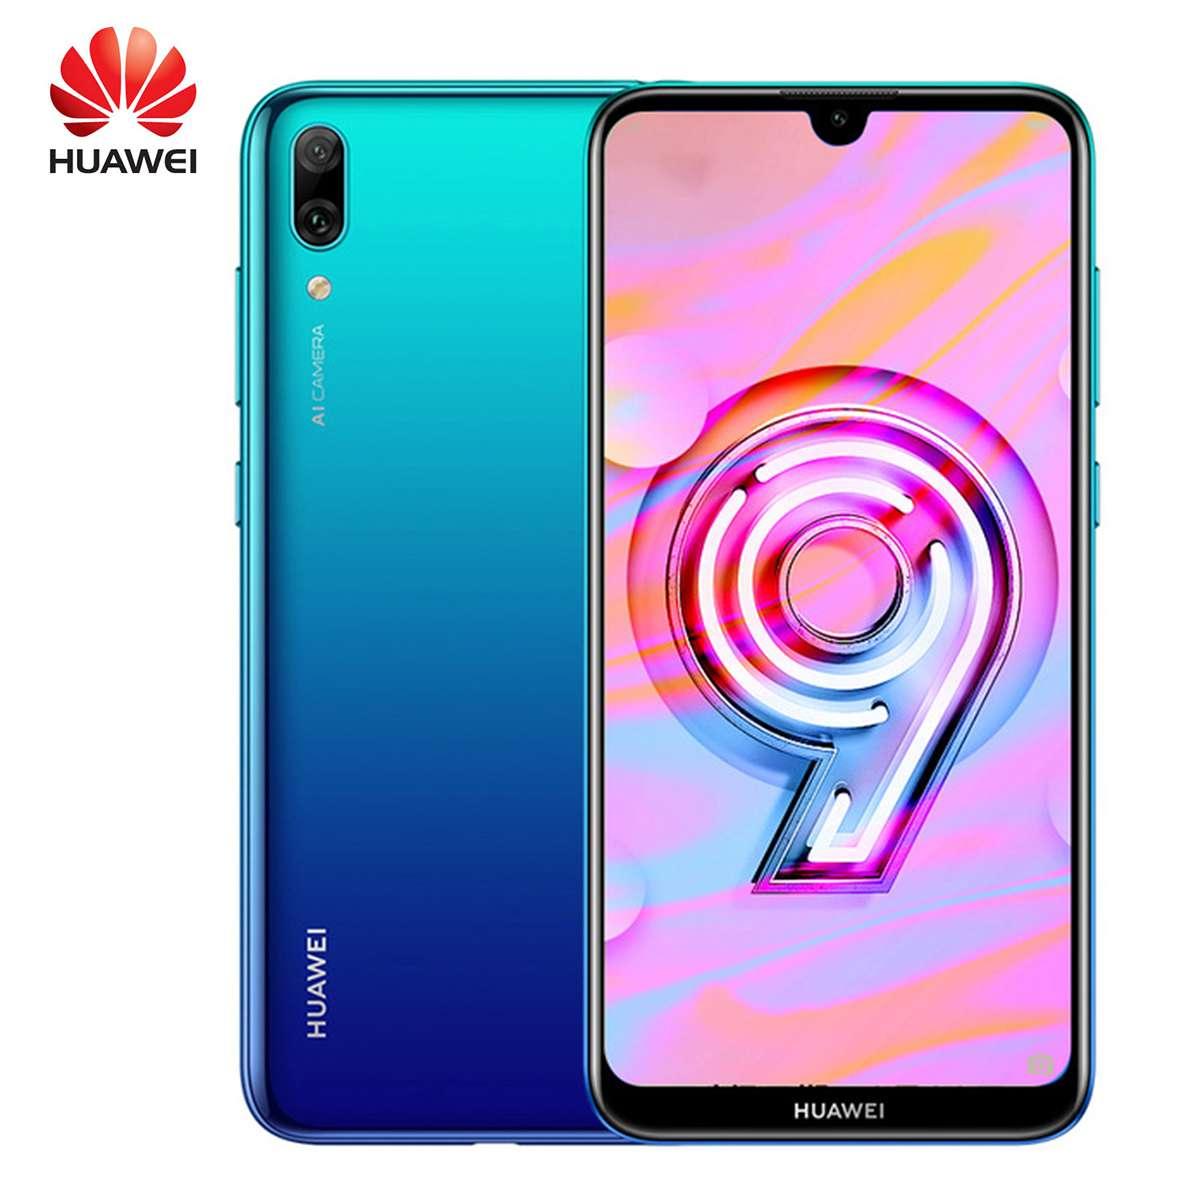 "Huawei Enjoy 9 Smart Phone 3+32G 6.26"" Android 8.1 Octa Core Huawei Y7 Pro Mobile Phone 4000mAh Dual Card Dual Stand 4000mAh"